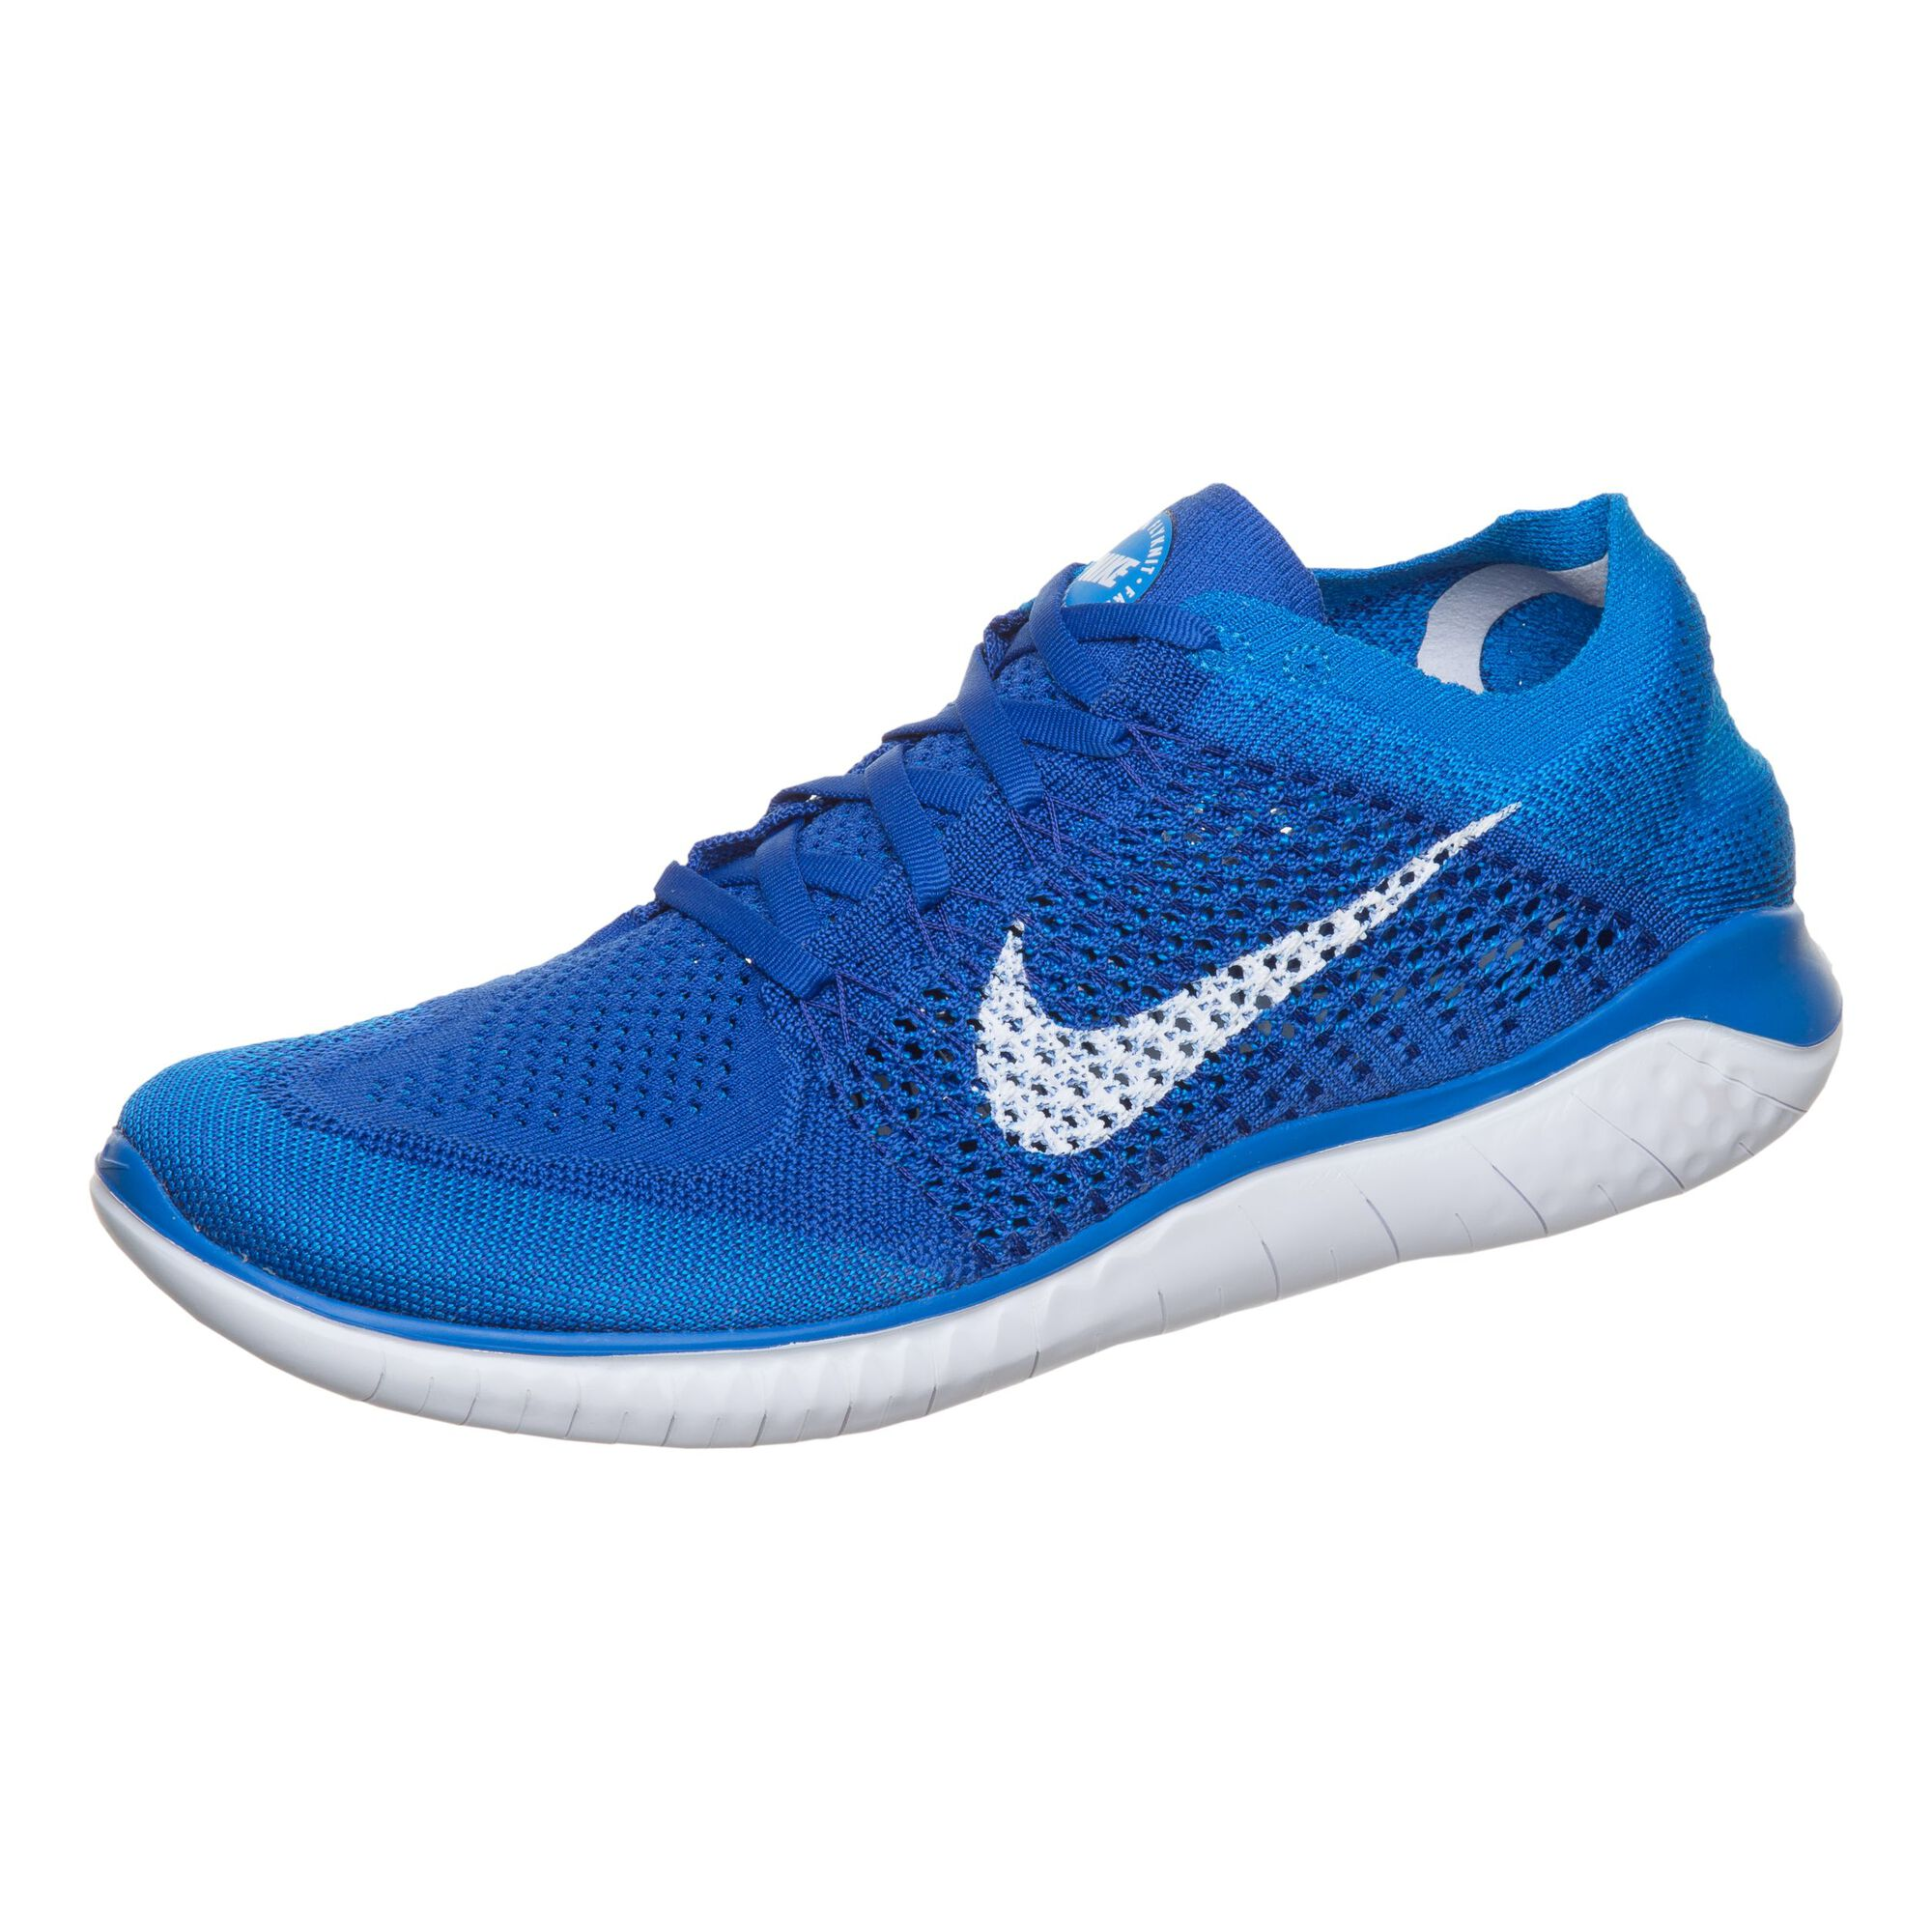 new style 12e33 129fa Nike Free Run Flyknit 2018 Natural-Running Schuh Herren - Blau ...